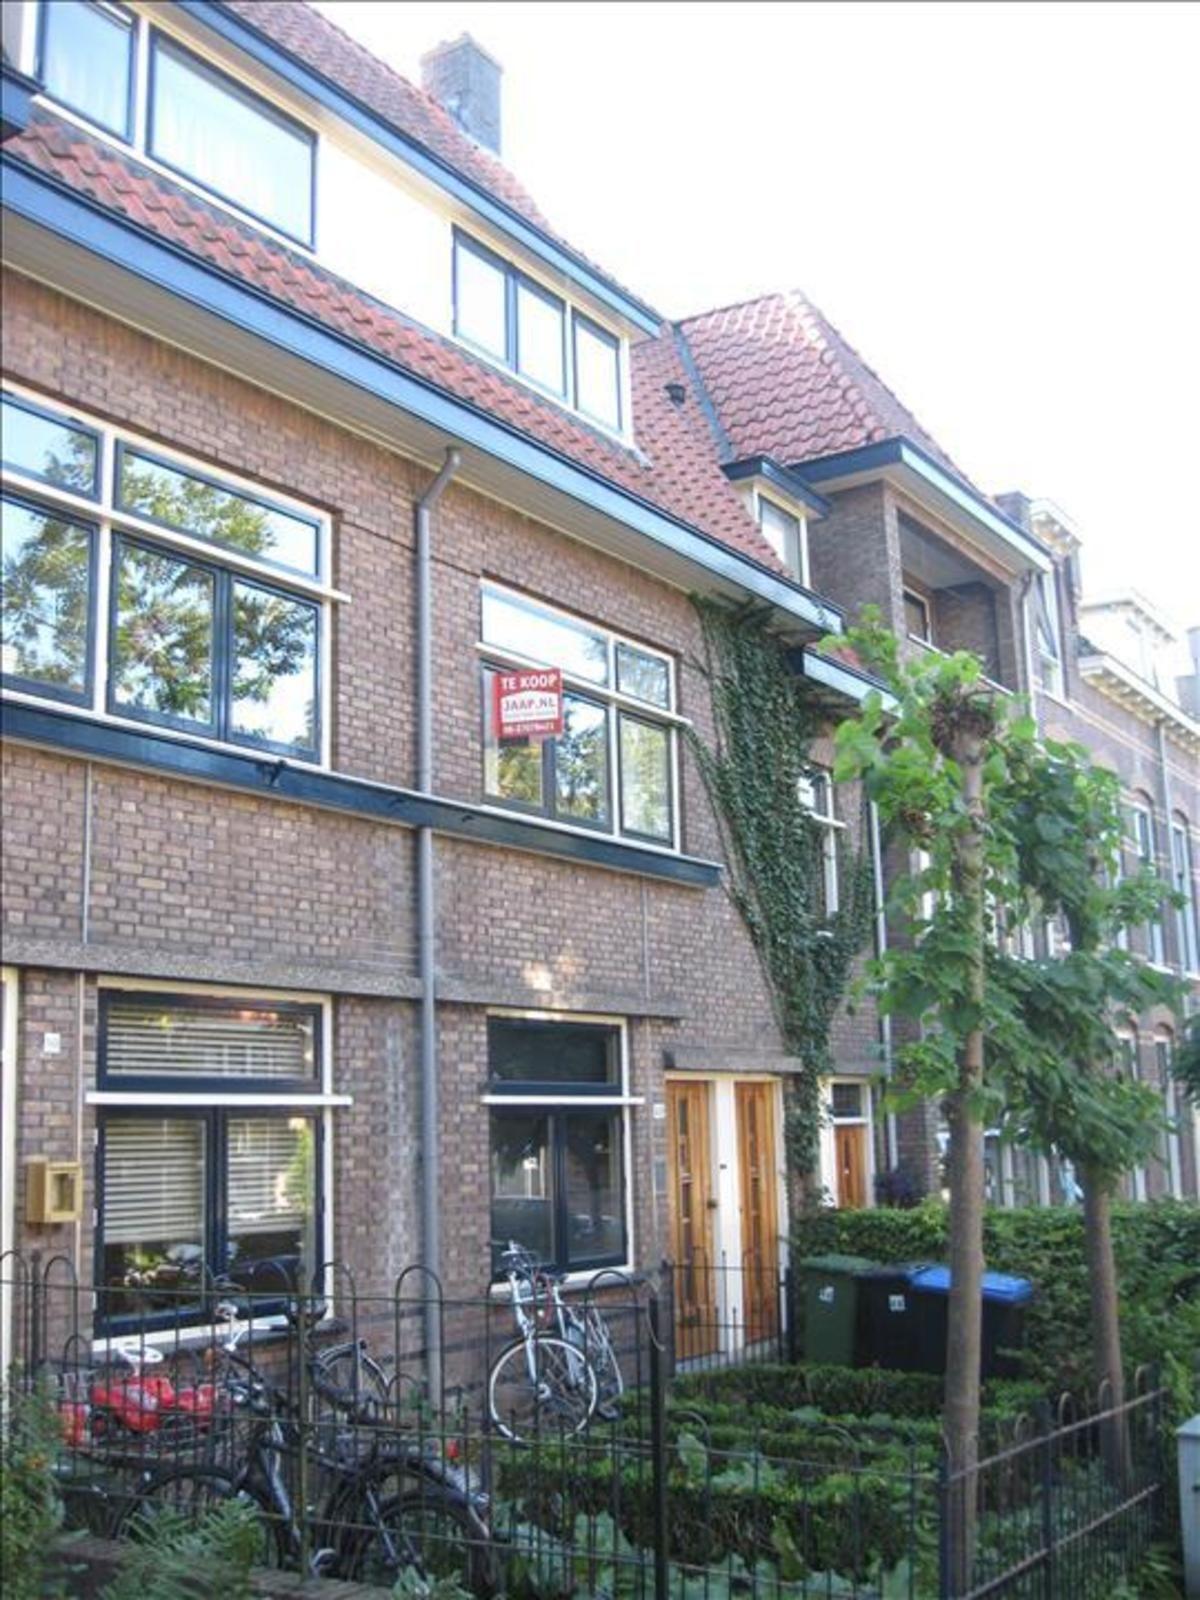 J.P. Heijestraat 46, Arnhem